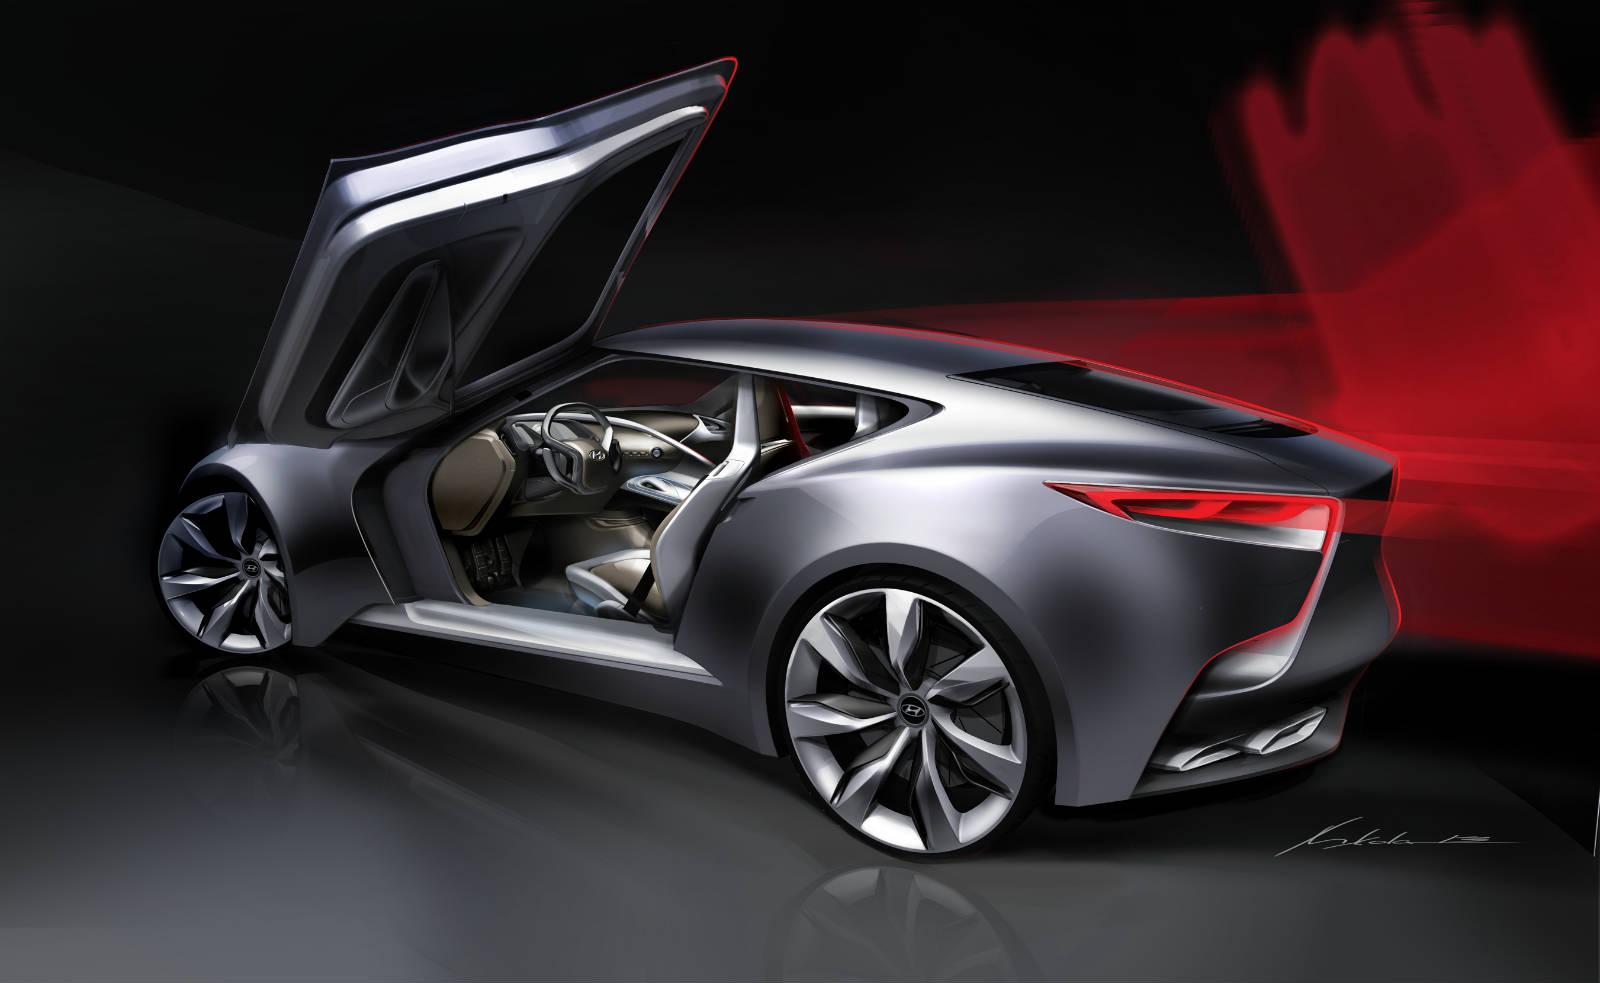 Hyundai S Unique Hnd 9 Luxury Sport Coupe Concept Unveiled